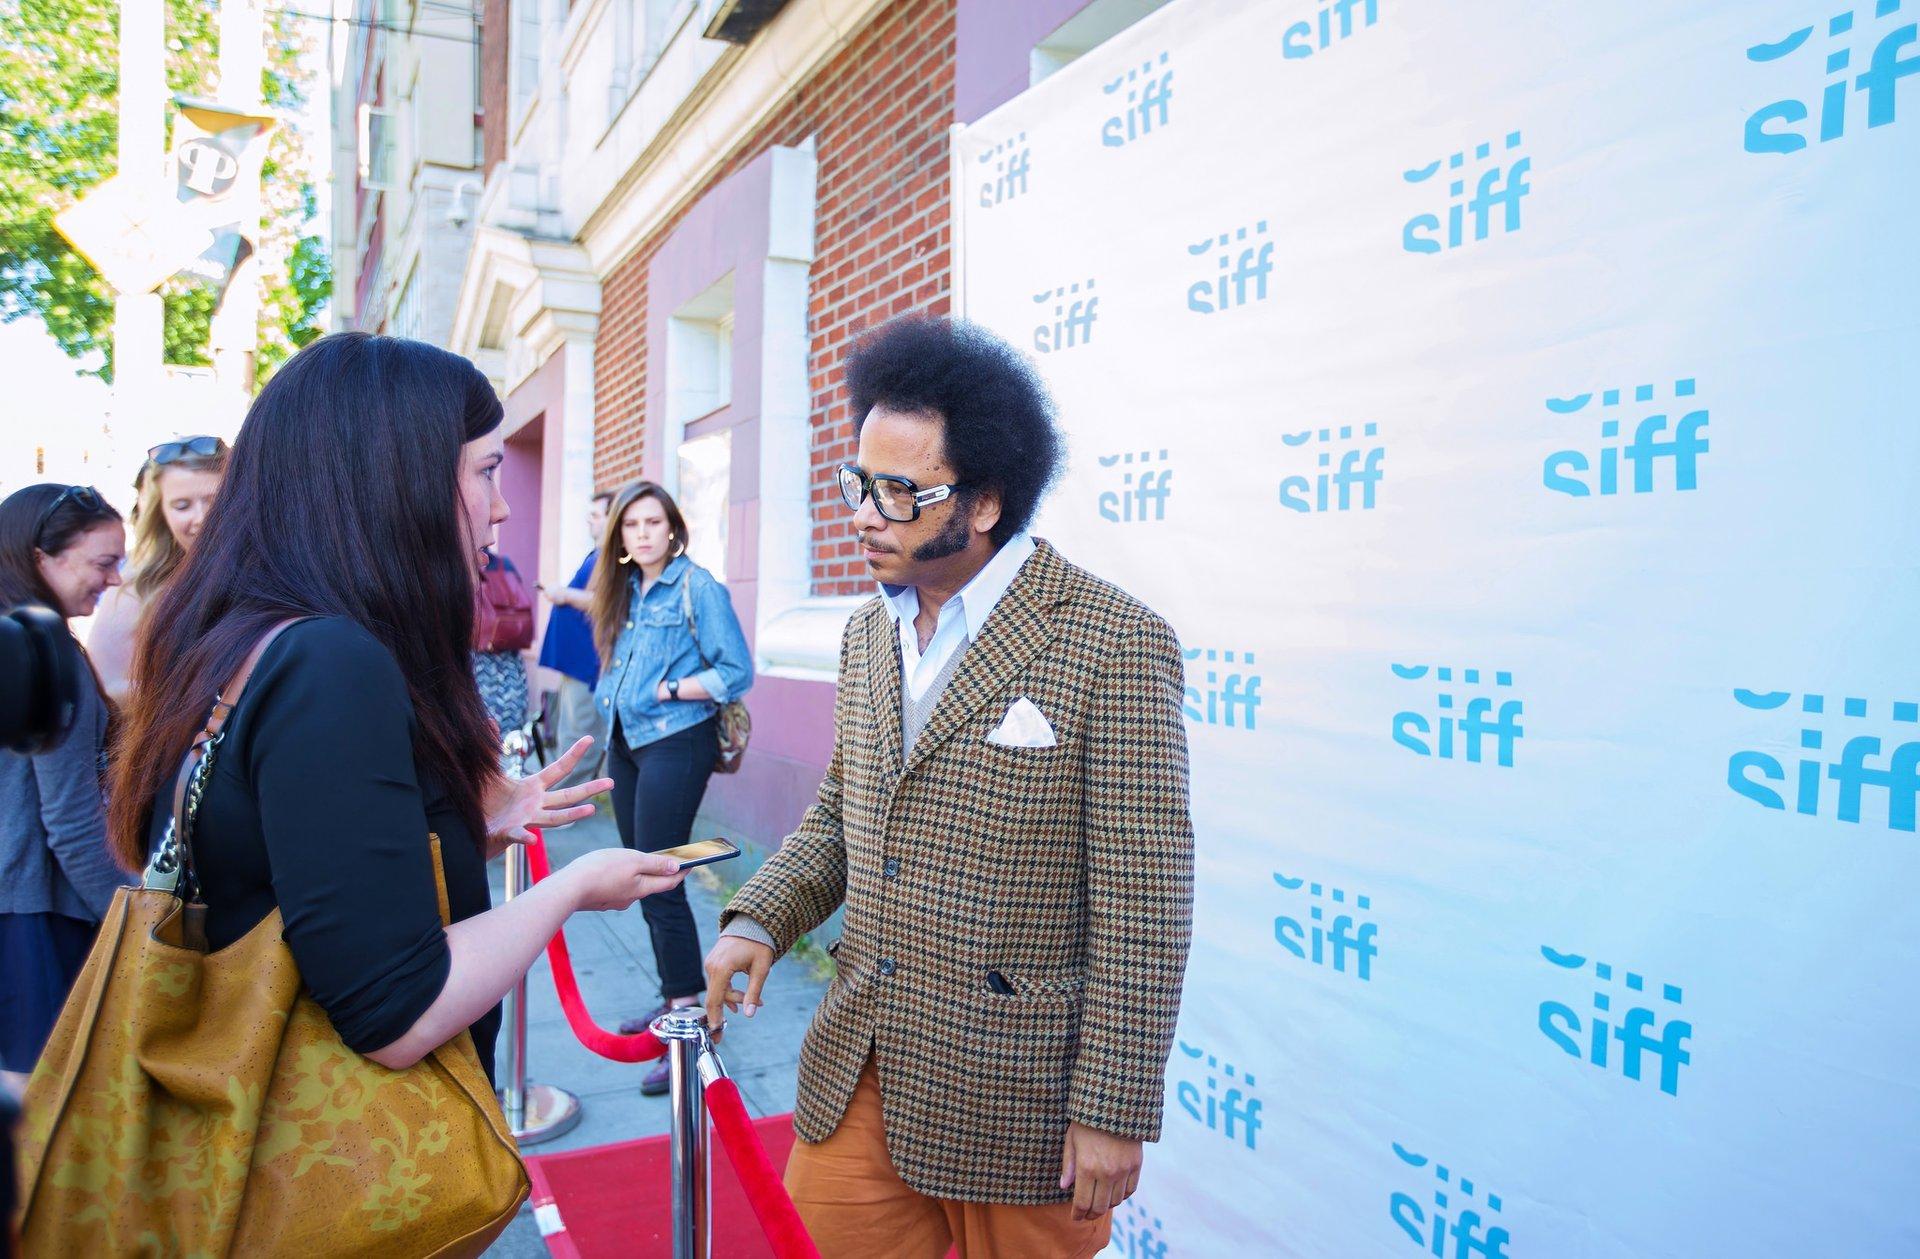 Best time for Seattle International Film Festival (SIFF) in Seattle 2020